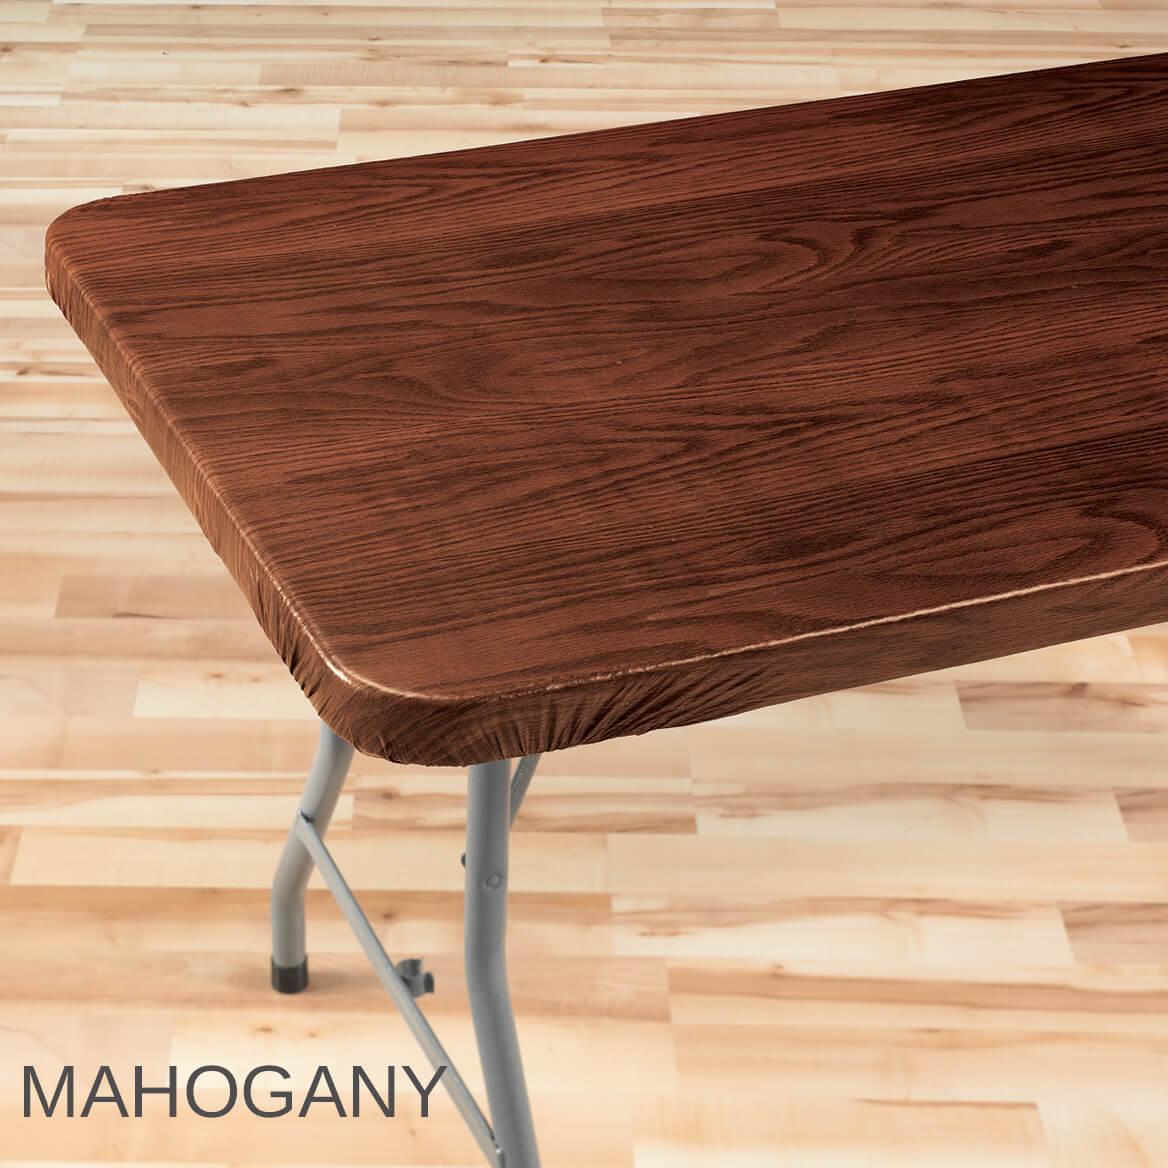 wood grain elasticized table cover  wood table cover  miles kimball - wood grain elasticized table cover